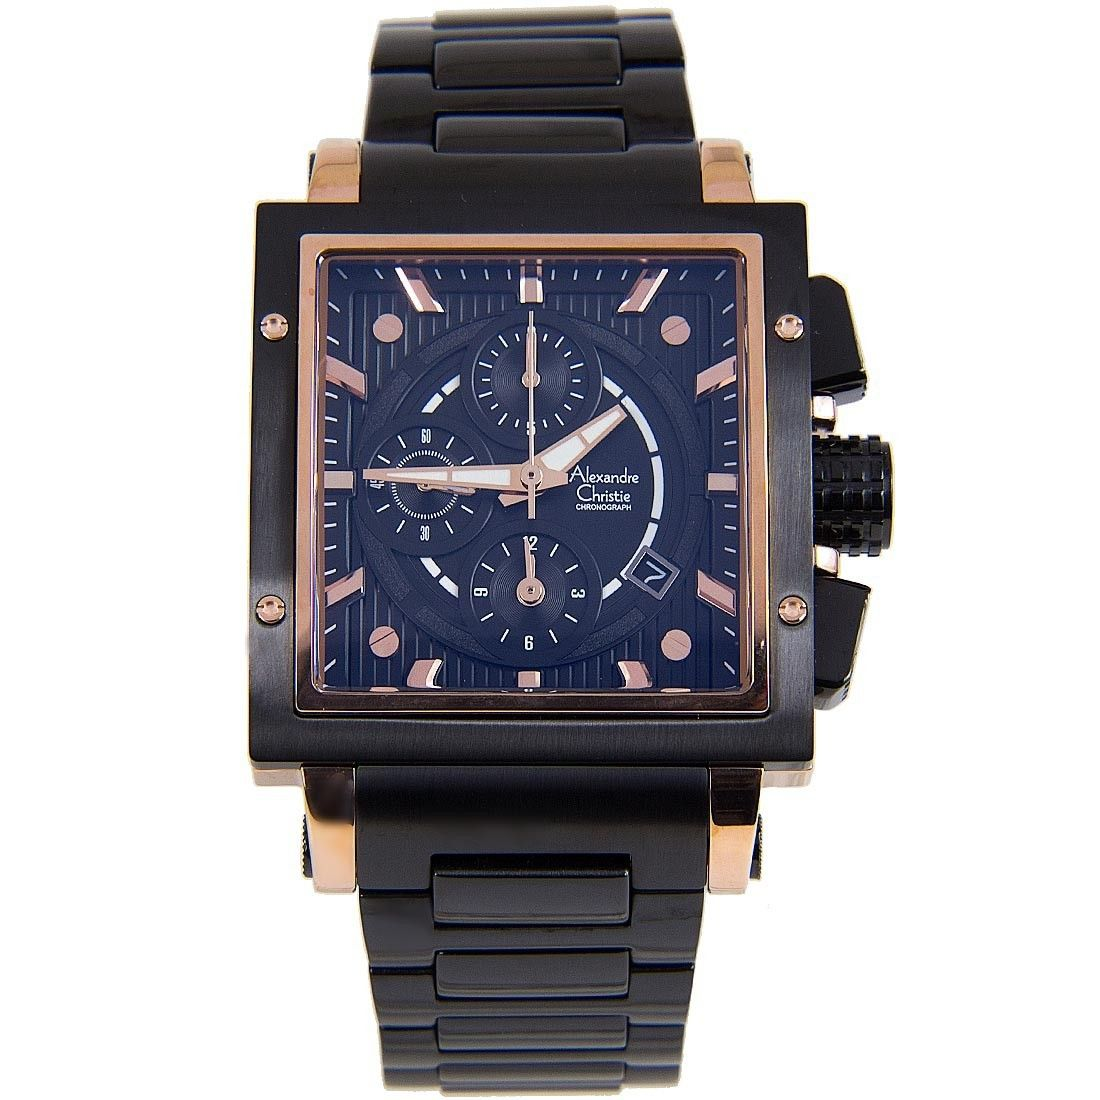 6182mcbbrba alexandre christie chronograph male watch